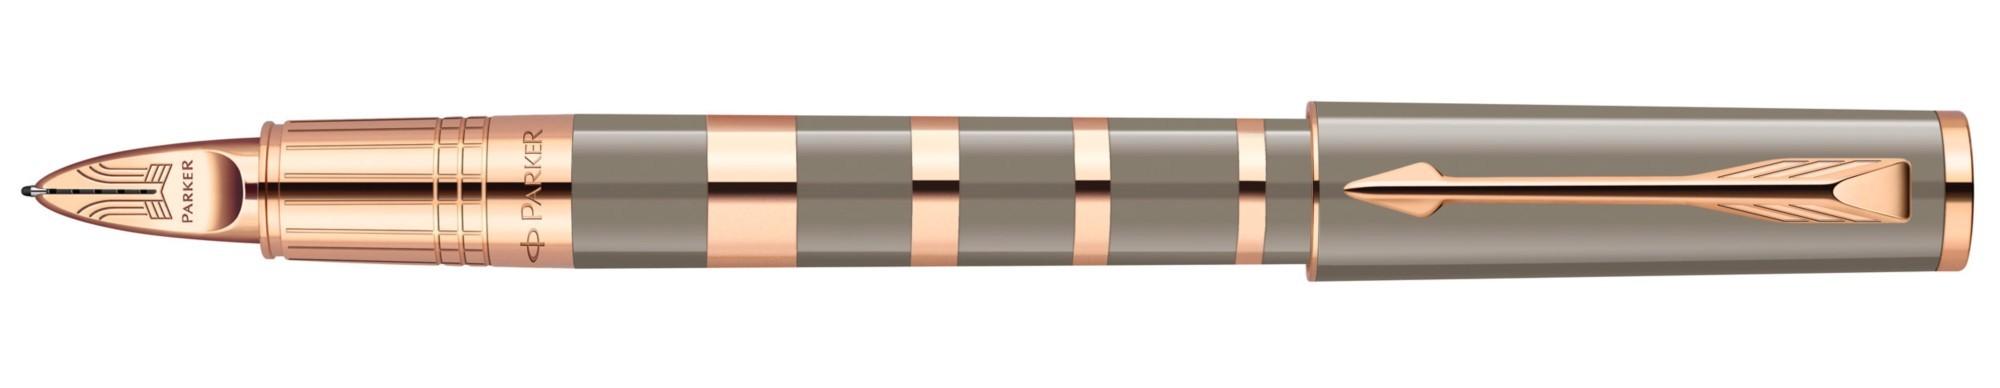 Ручка 5й пишущий узел Parker Ingenuity Ring Taupe&Metal PGT